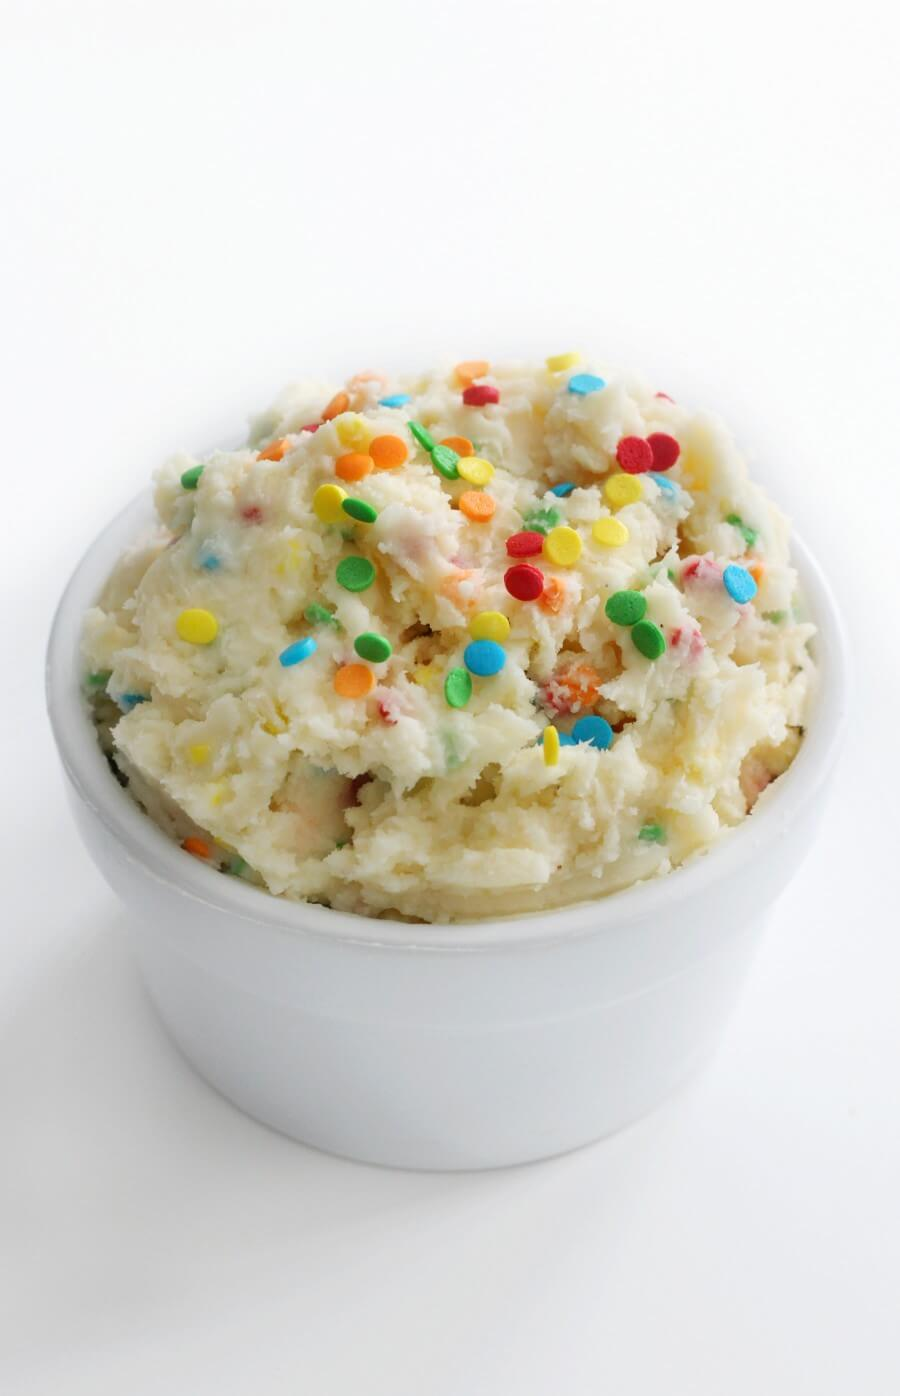 vegan dunkaroos dip with sprinkles in white bowl